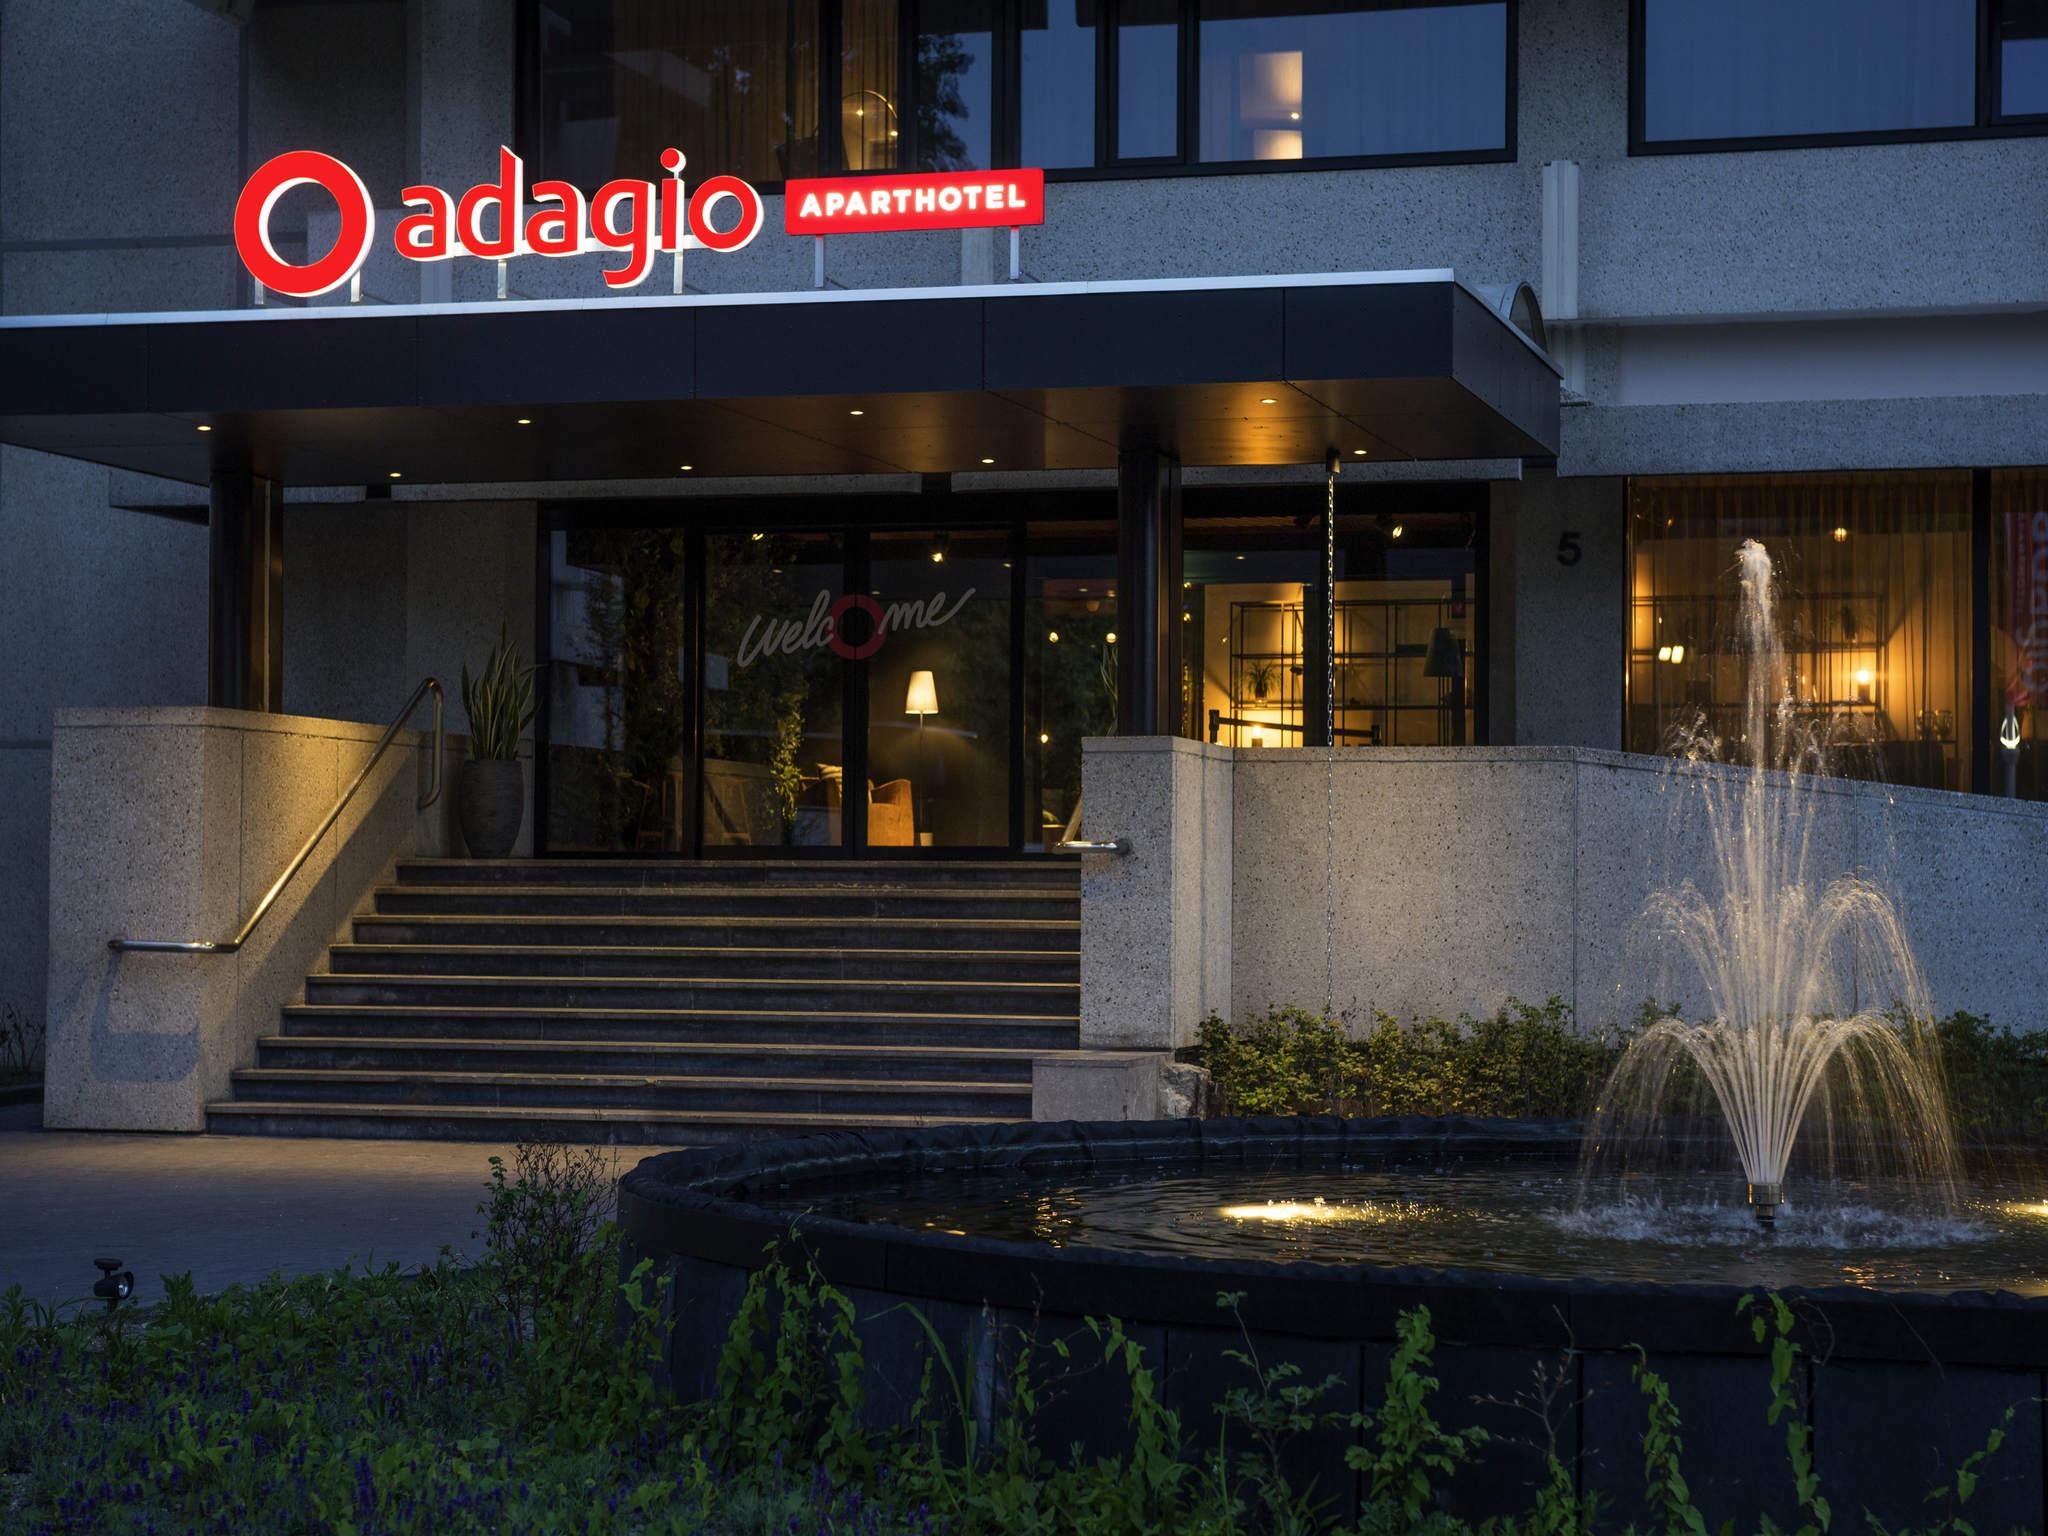 Hotel a amstelveen aparthotel adagio amsterdam city south for Vendita appartamenti amsterdam